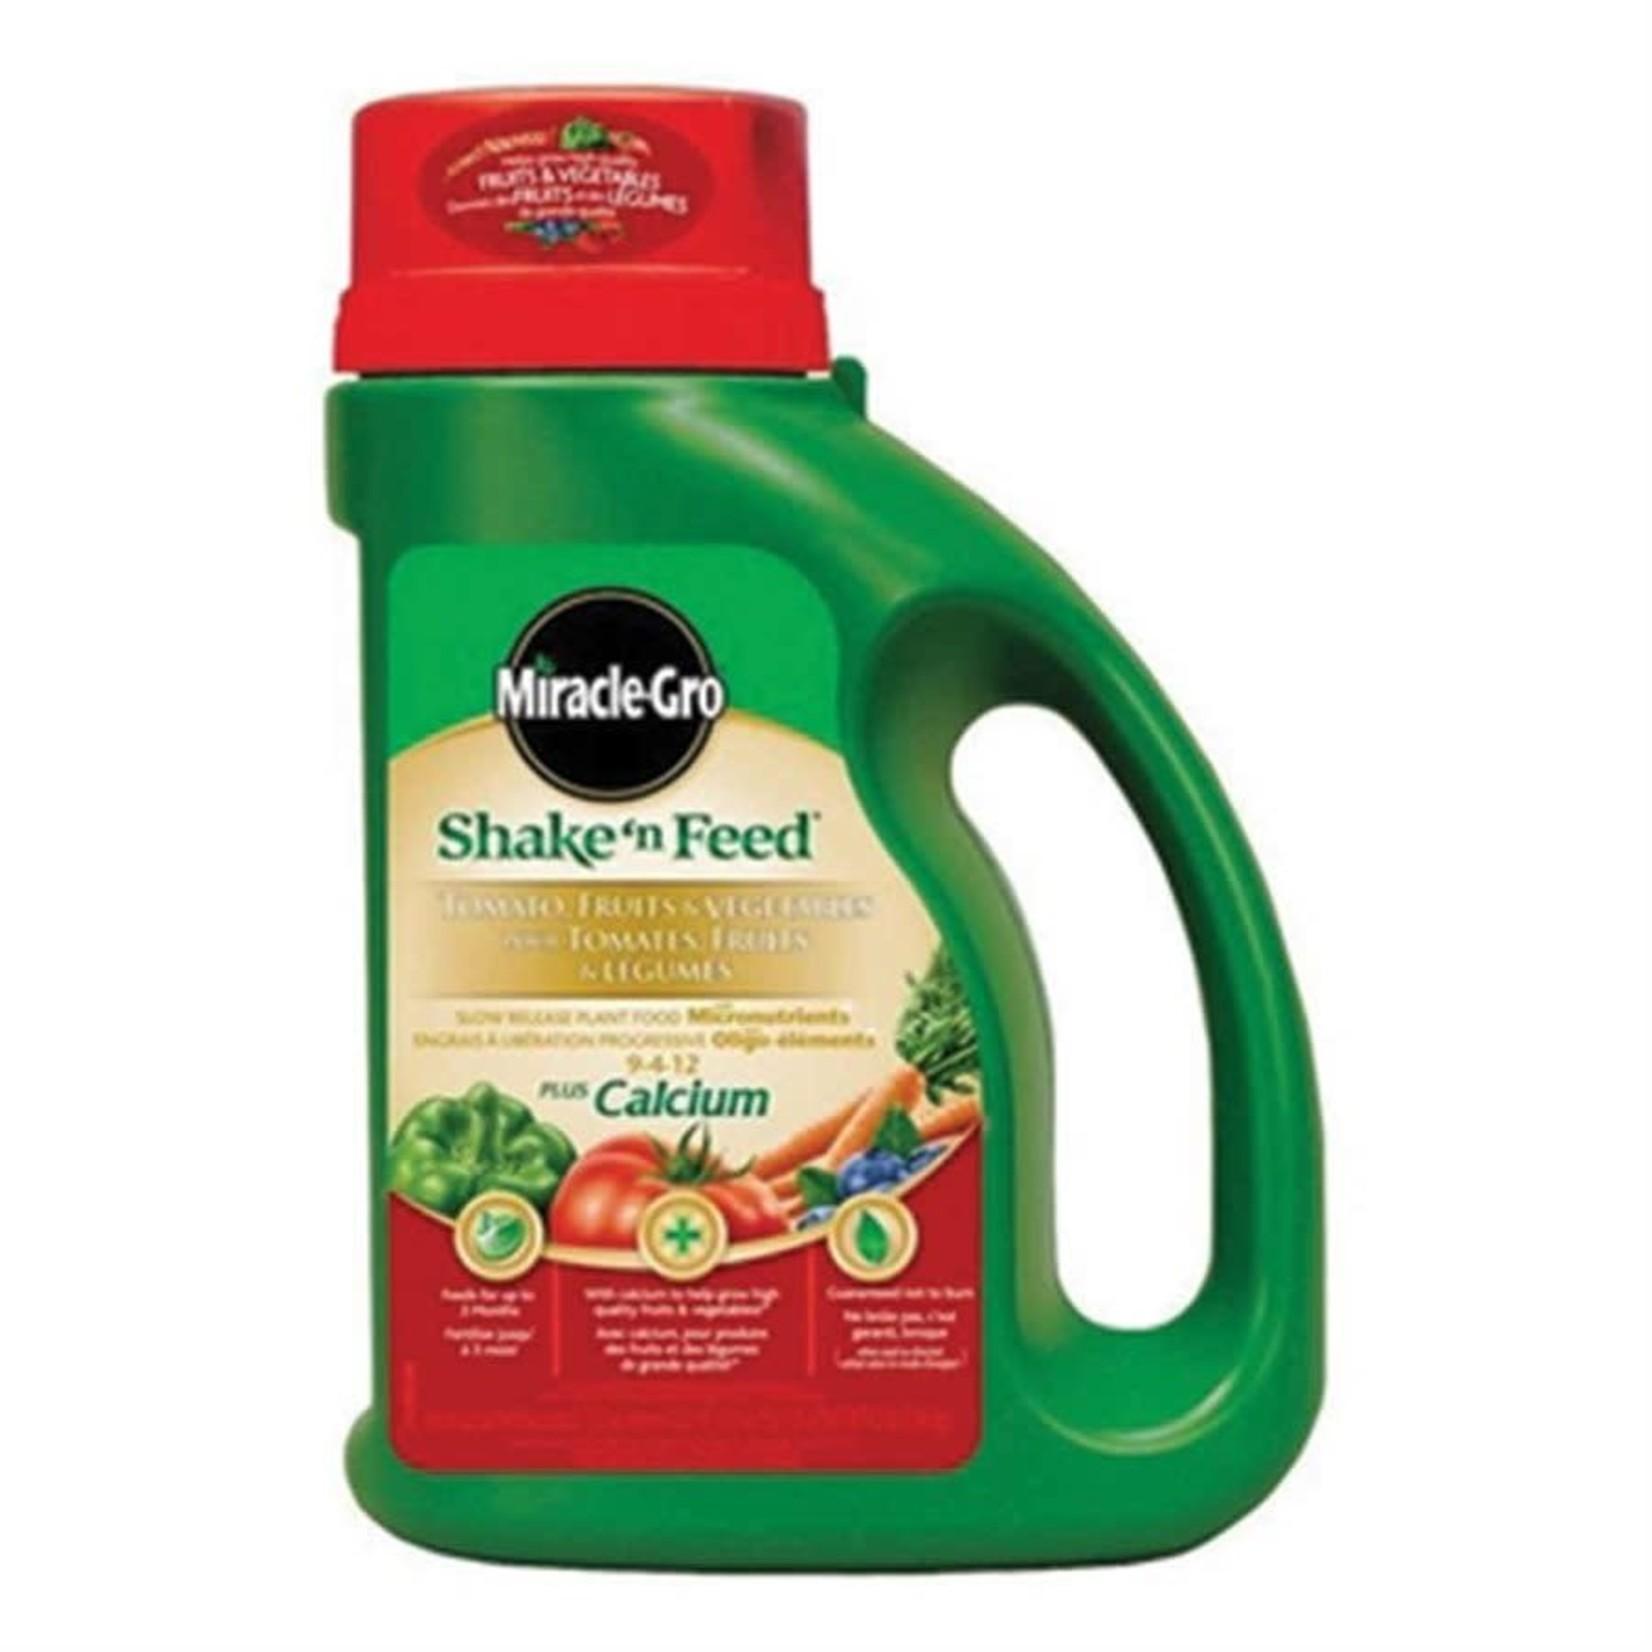 Miracle-Gro Shake 'n Feed Tomato Fruit Veg 18-18-21, 2.04kg